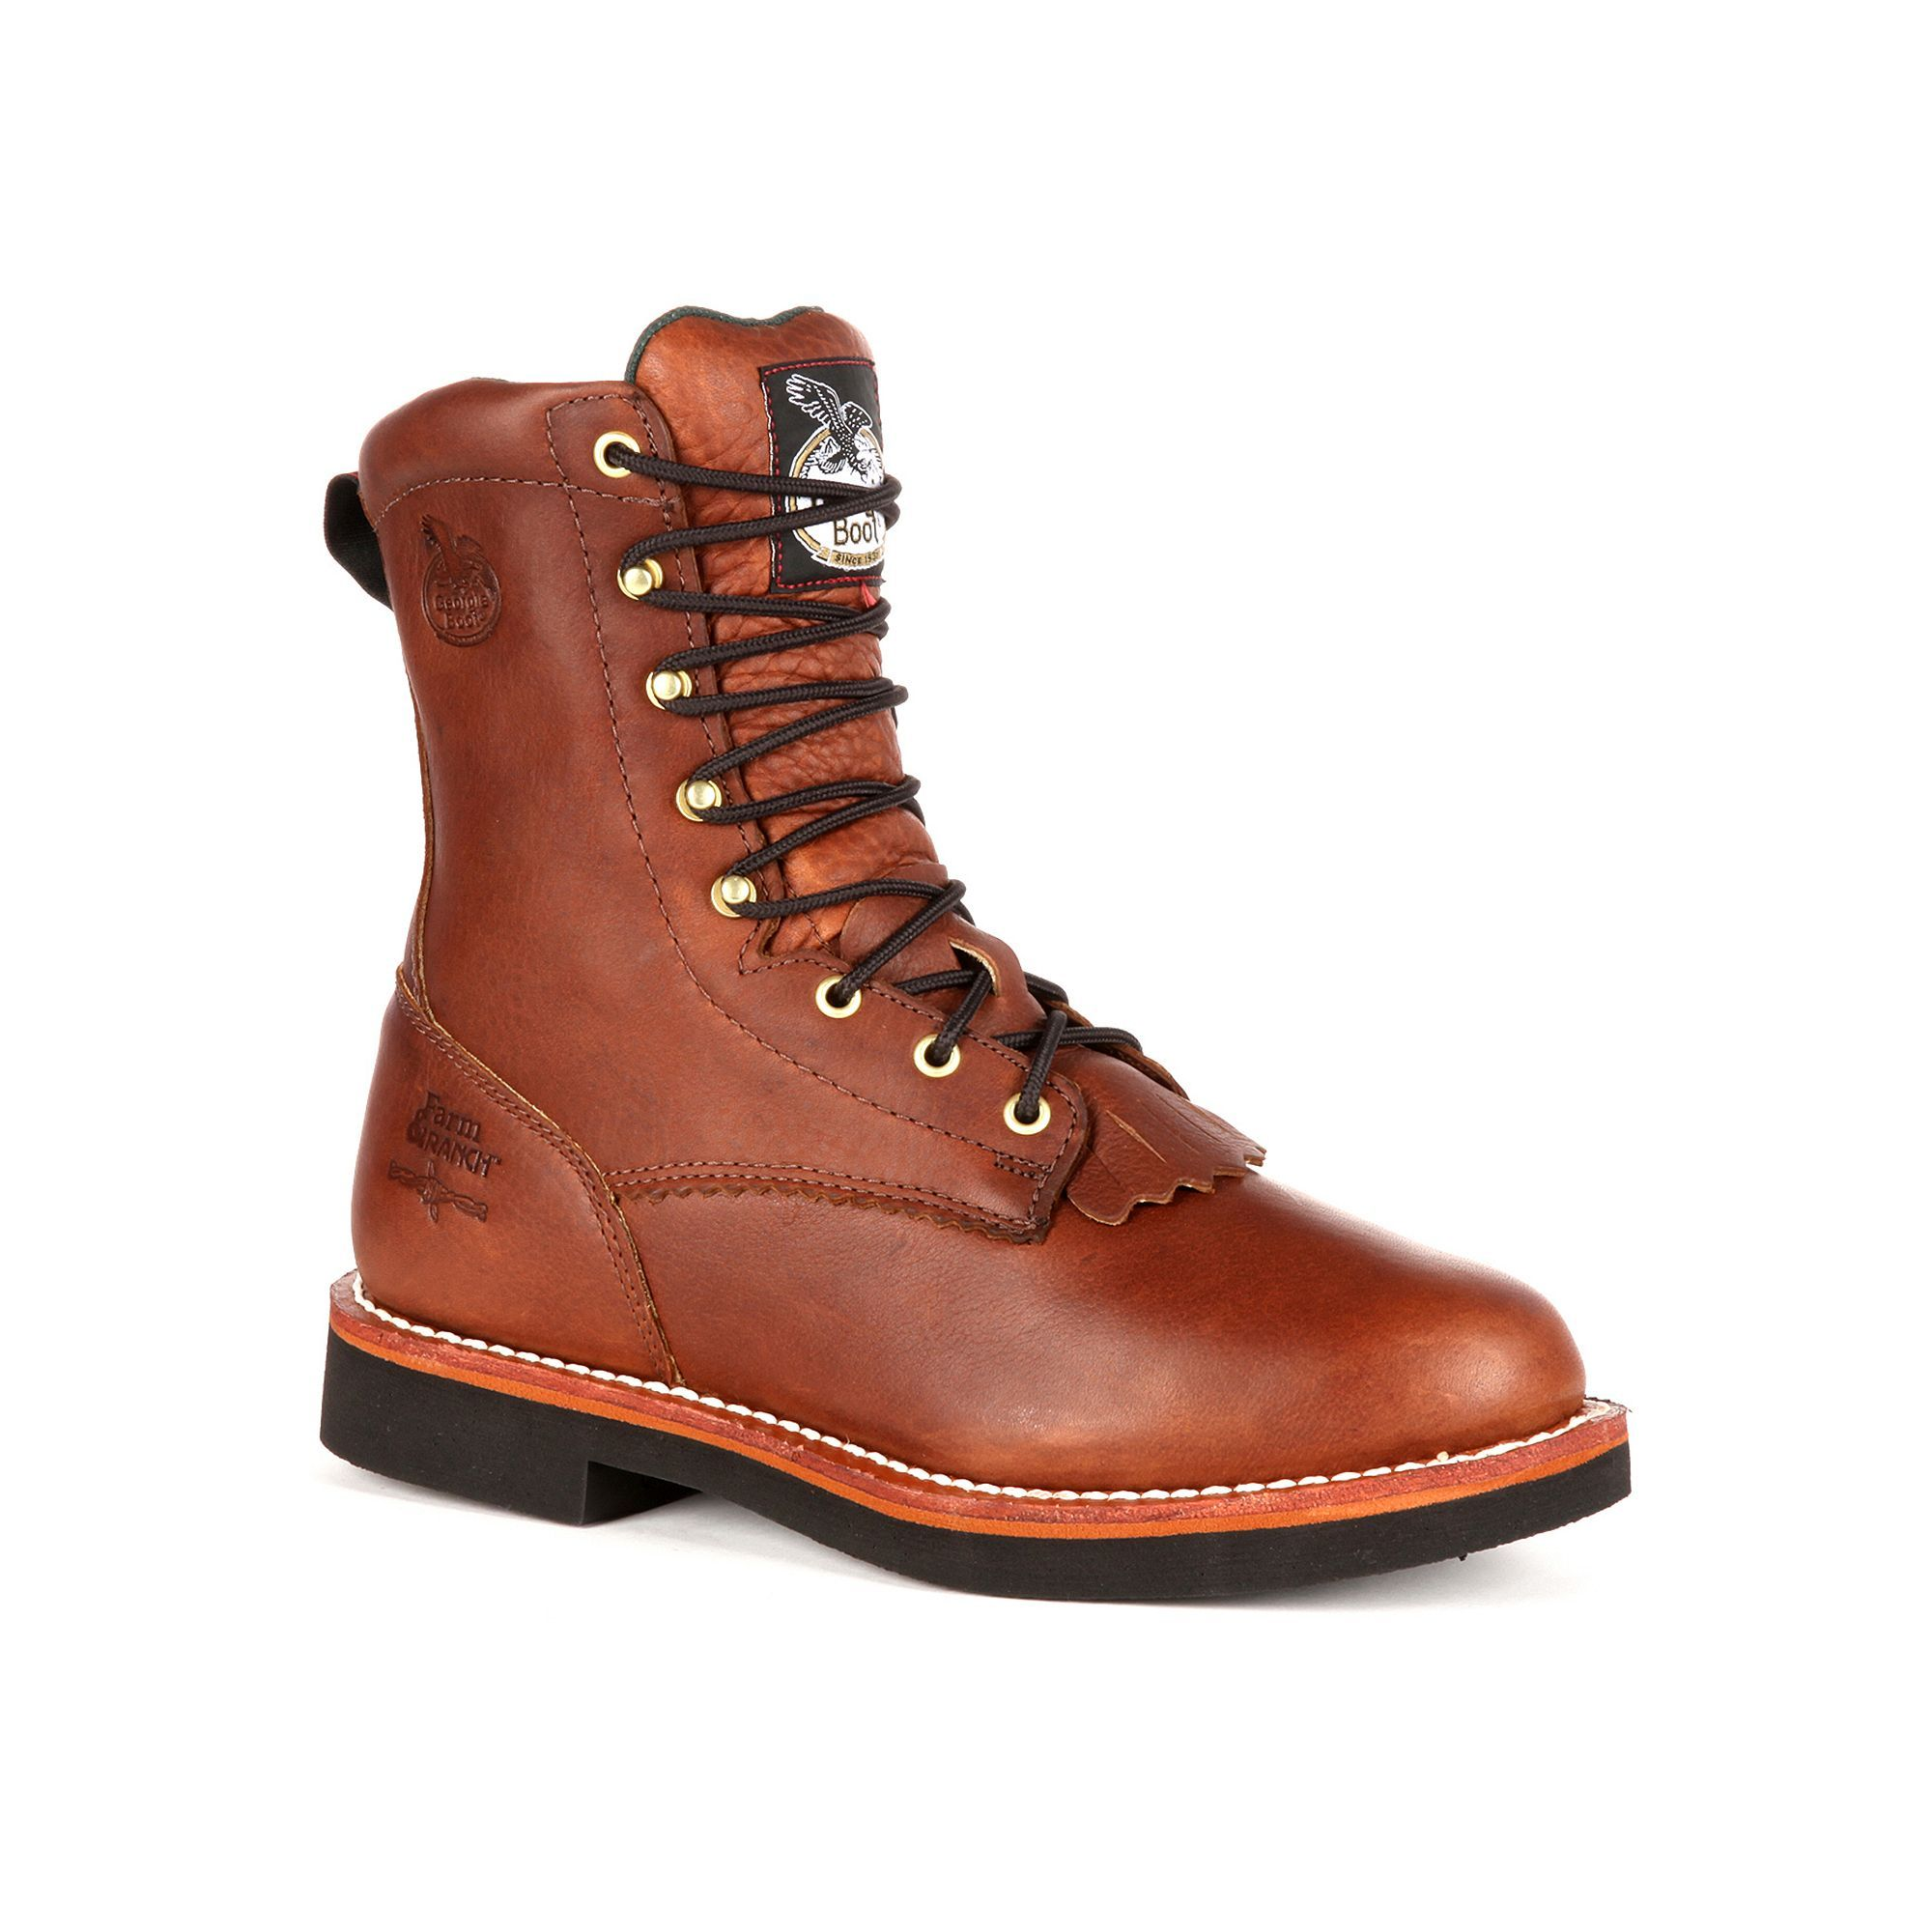 10 W US Georgia Boot Mens Homeland 8 Inch Steel Toe Work Shoe Brown